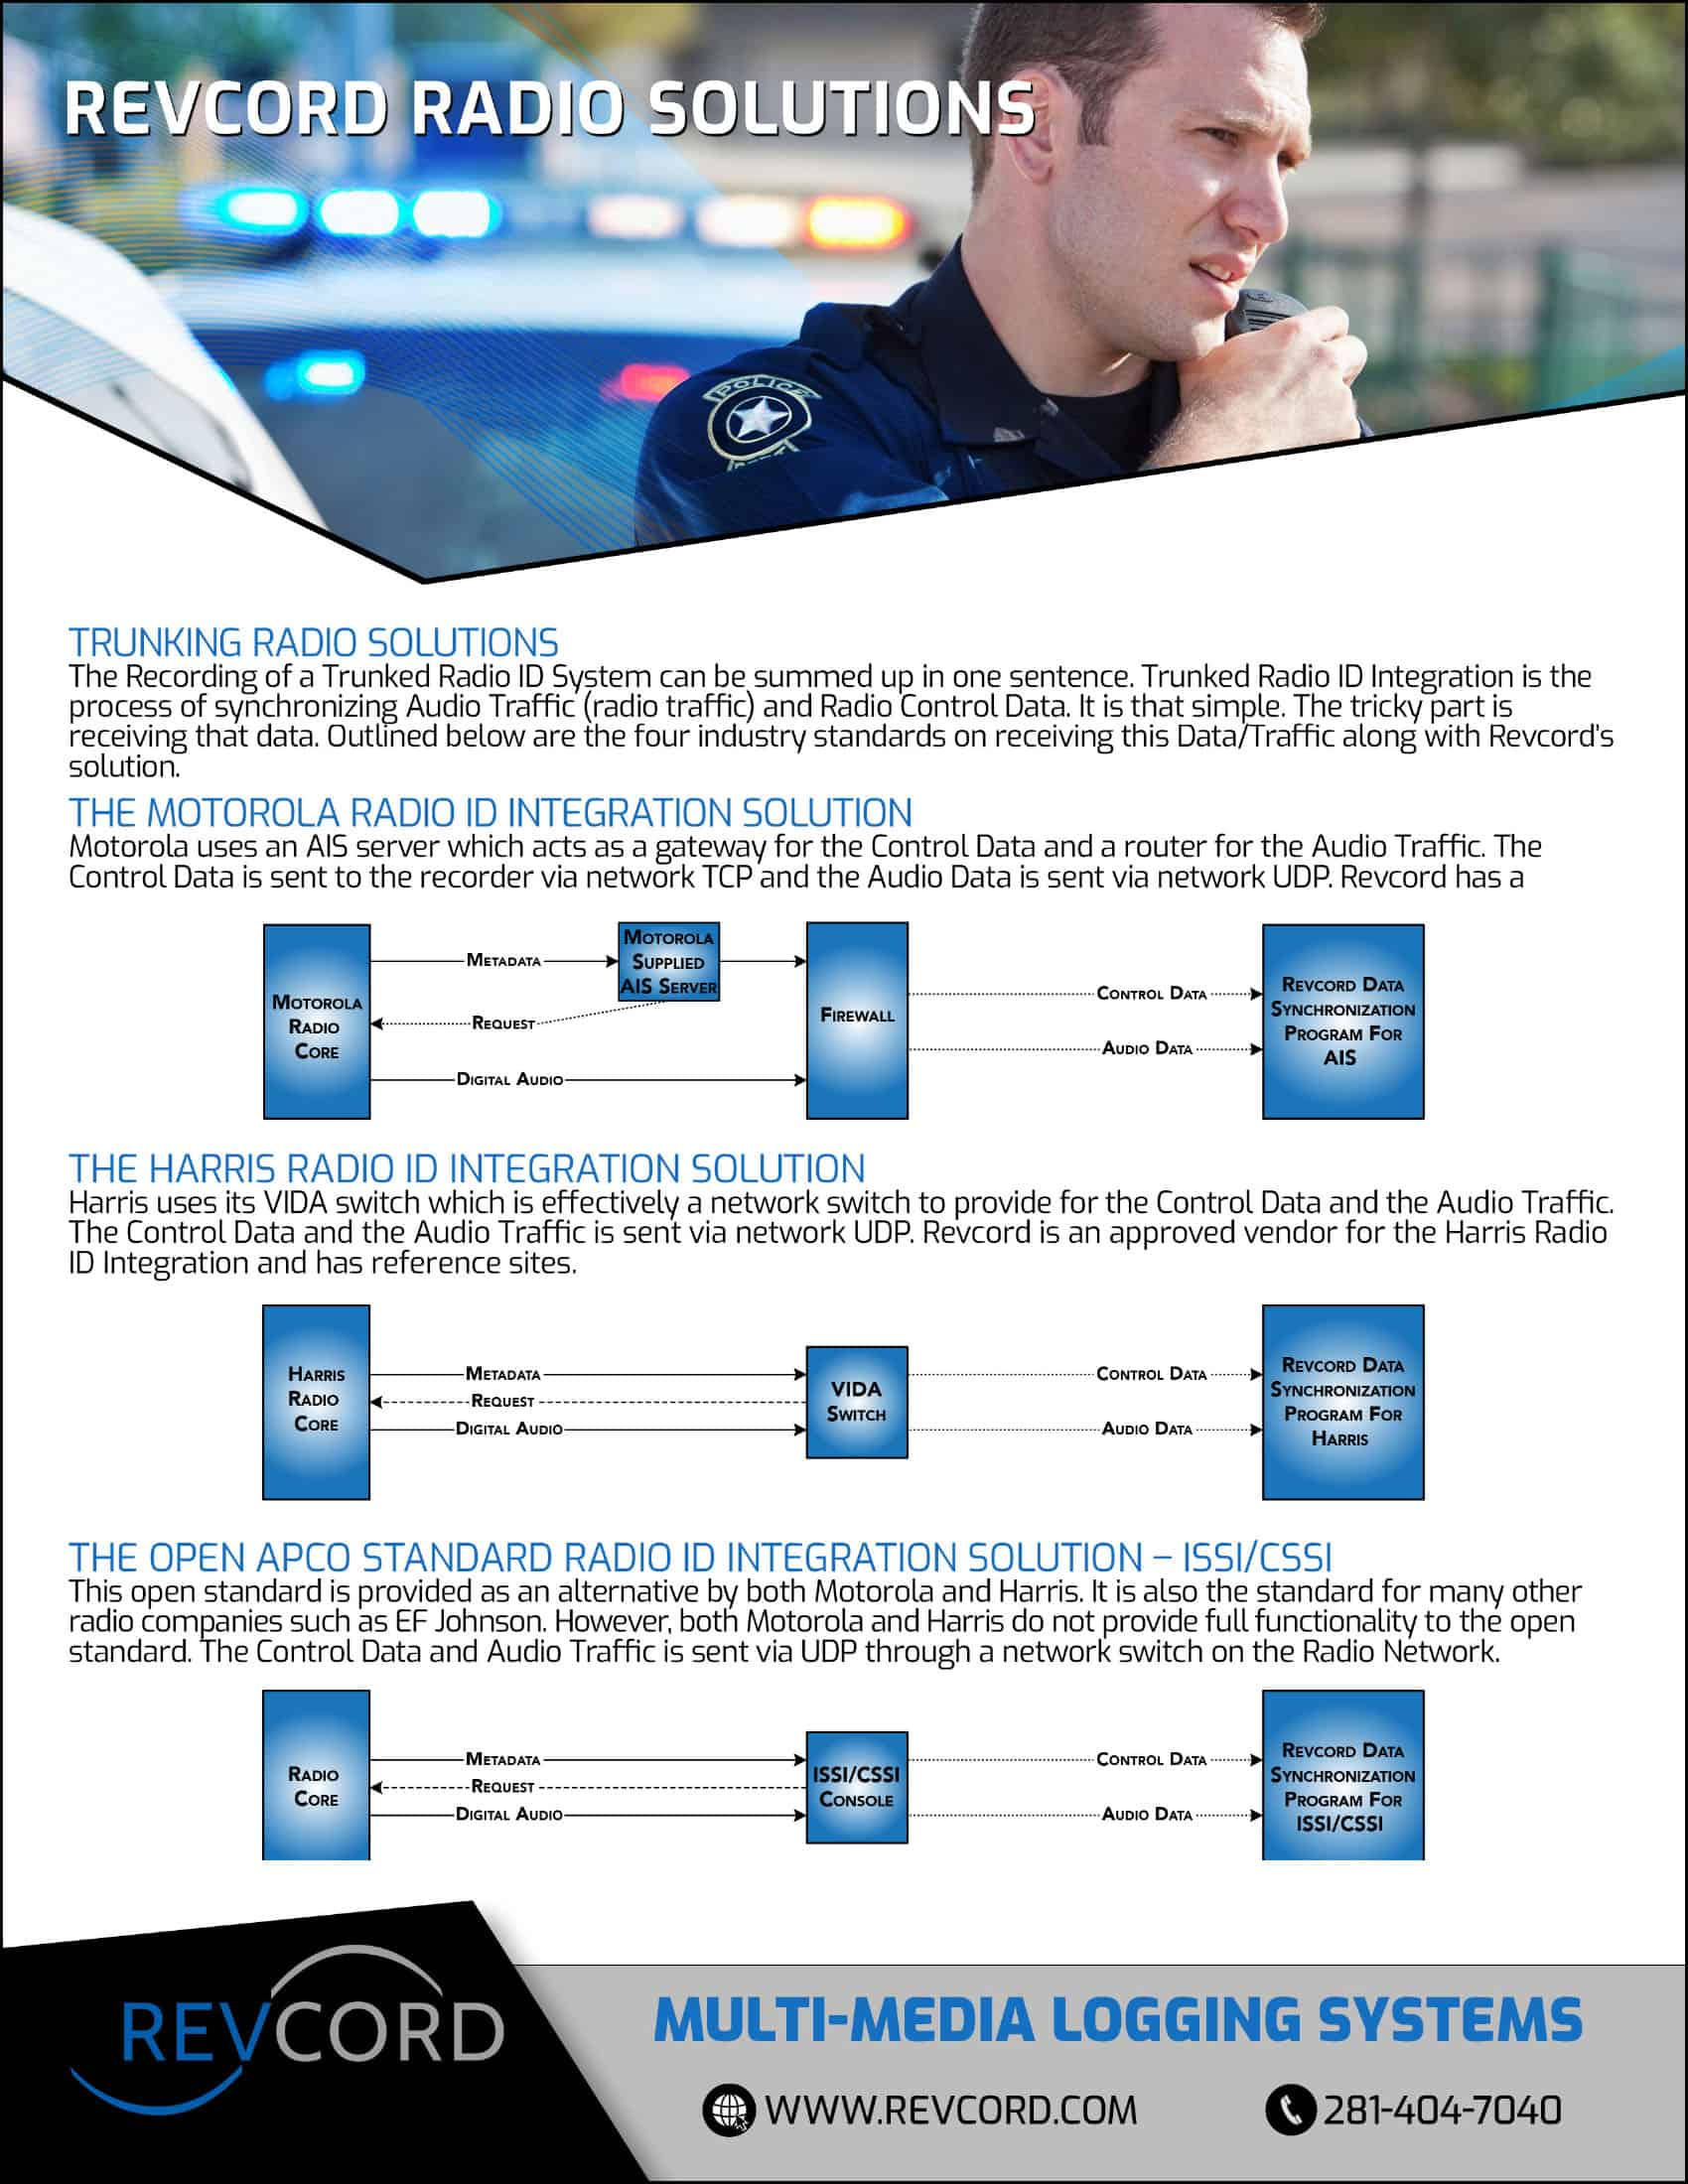 Revcord Radio Solutions